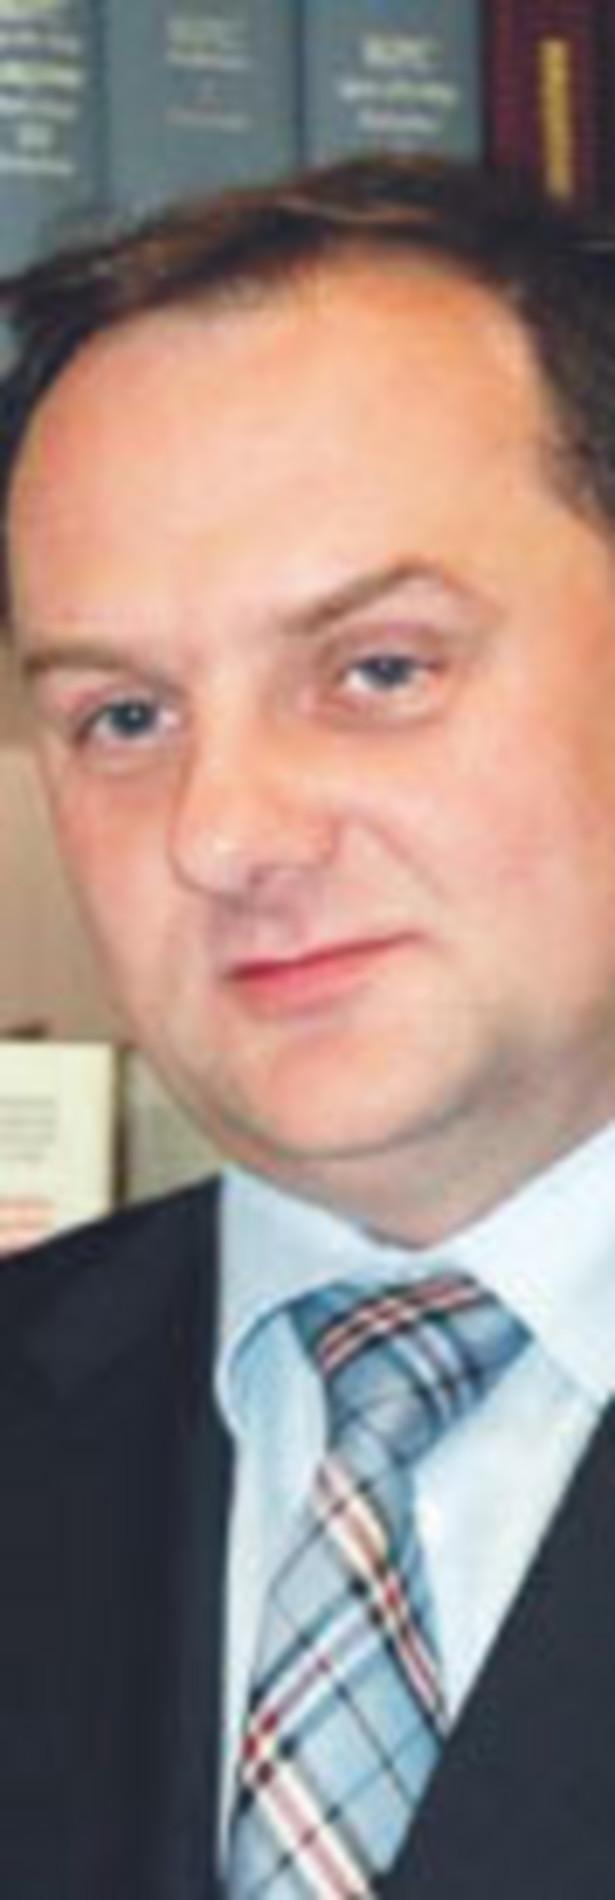 Józef Forystek, Kancelaria Forystek & Partnerzy - opinia